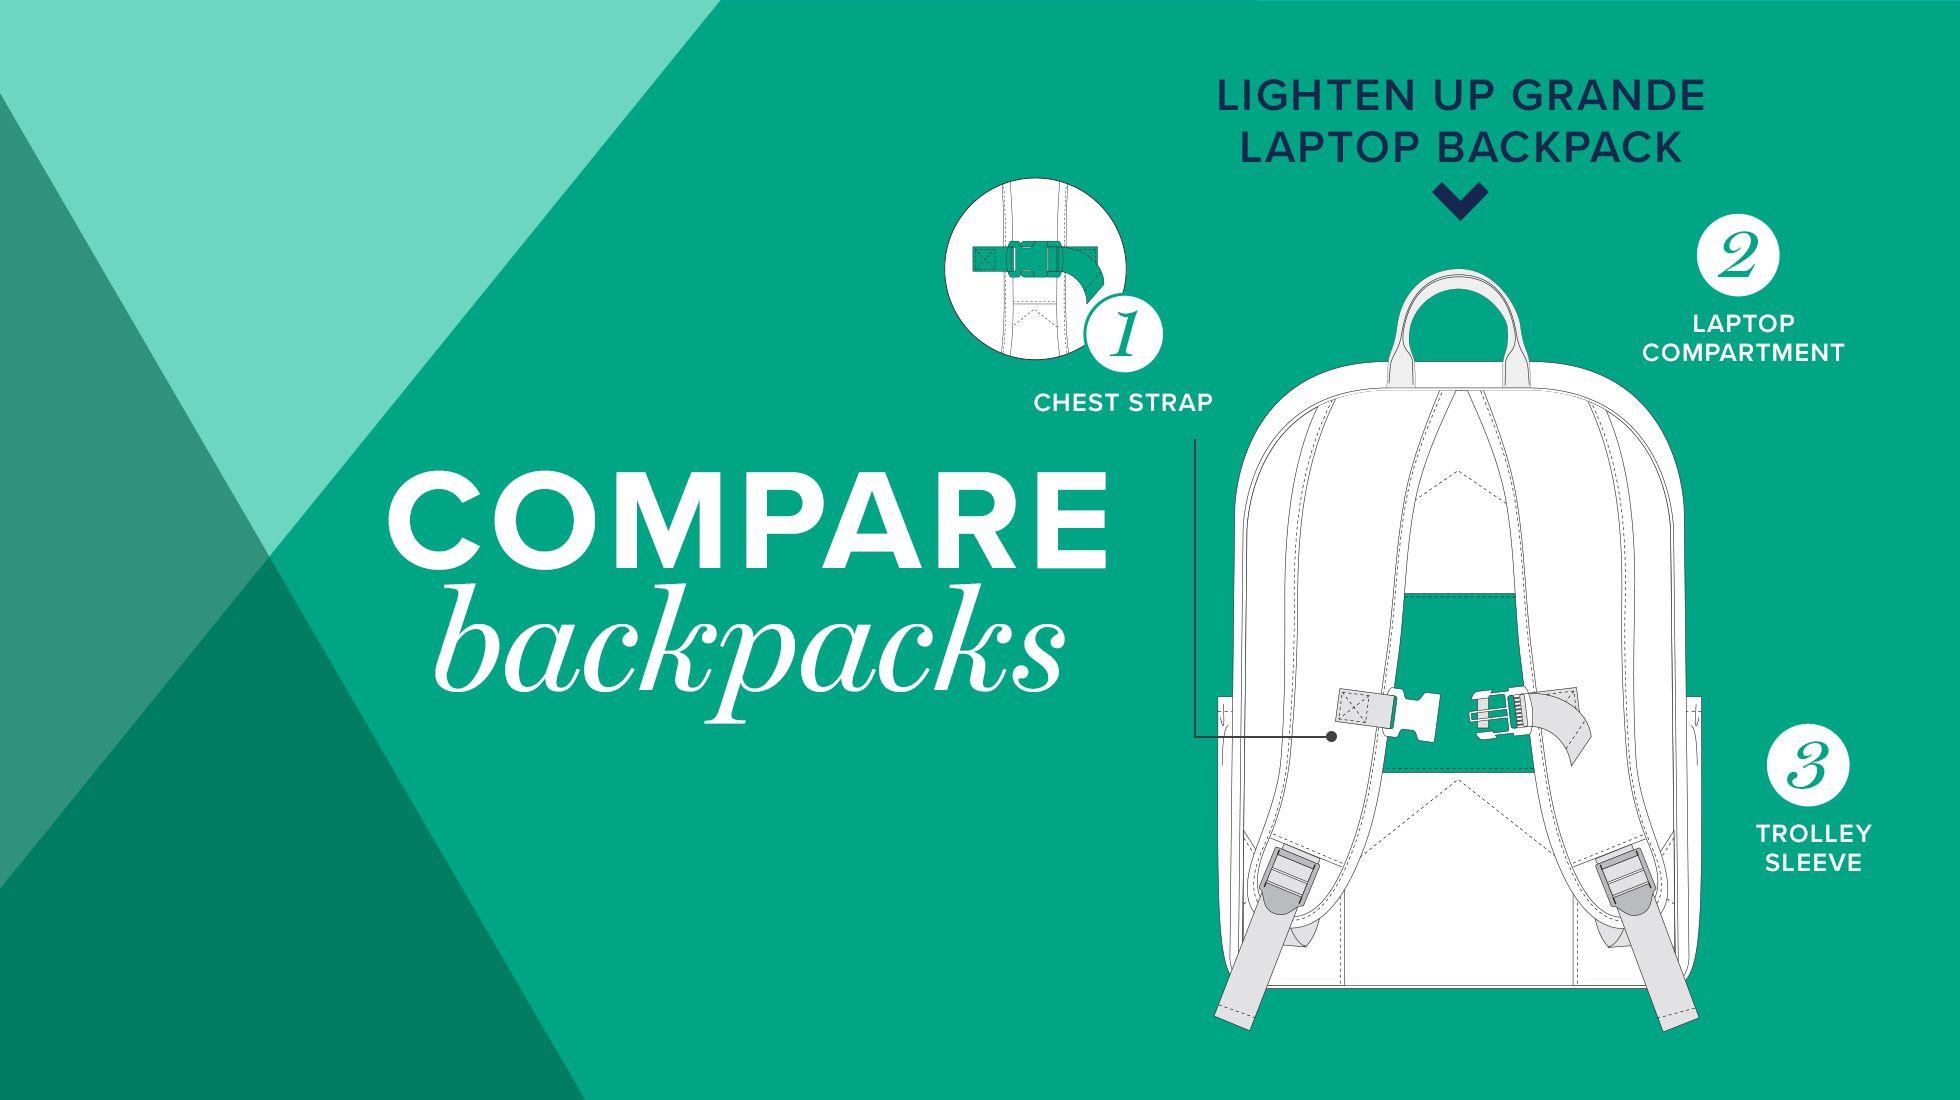 Lighten Up Grande Laptop Backpack